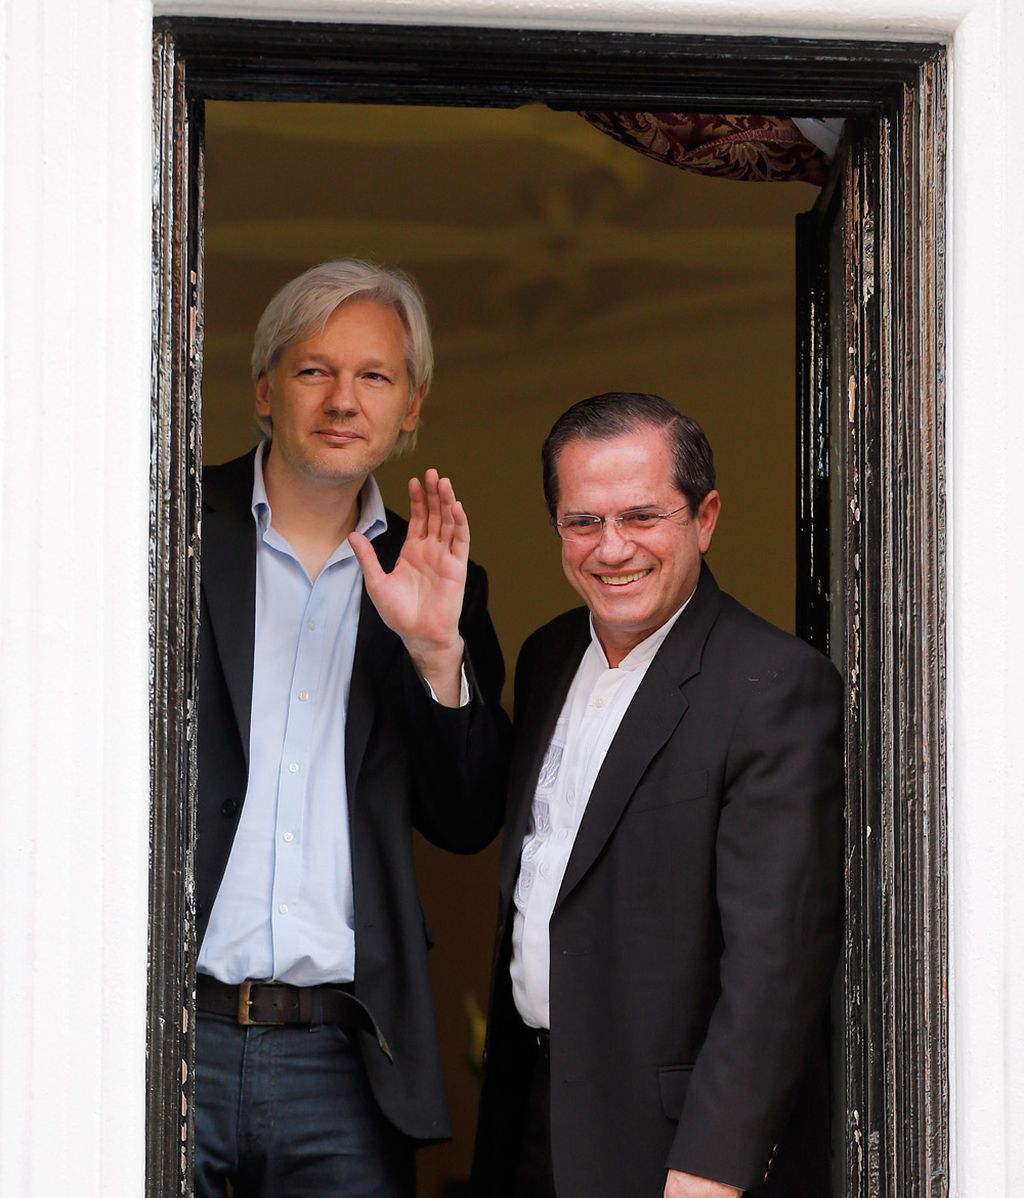 Assange con el ministro de Exteriores de Ecuador, Ricardo Patino